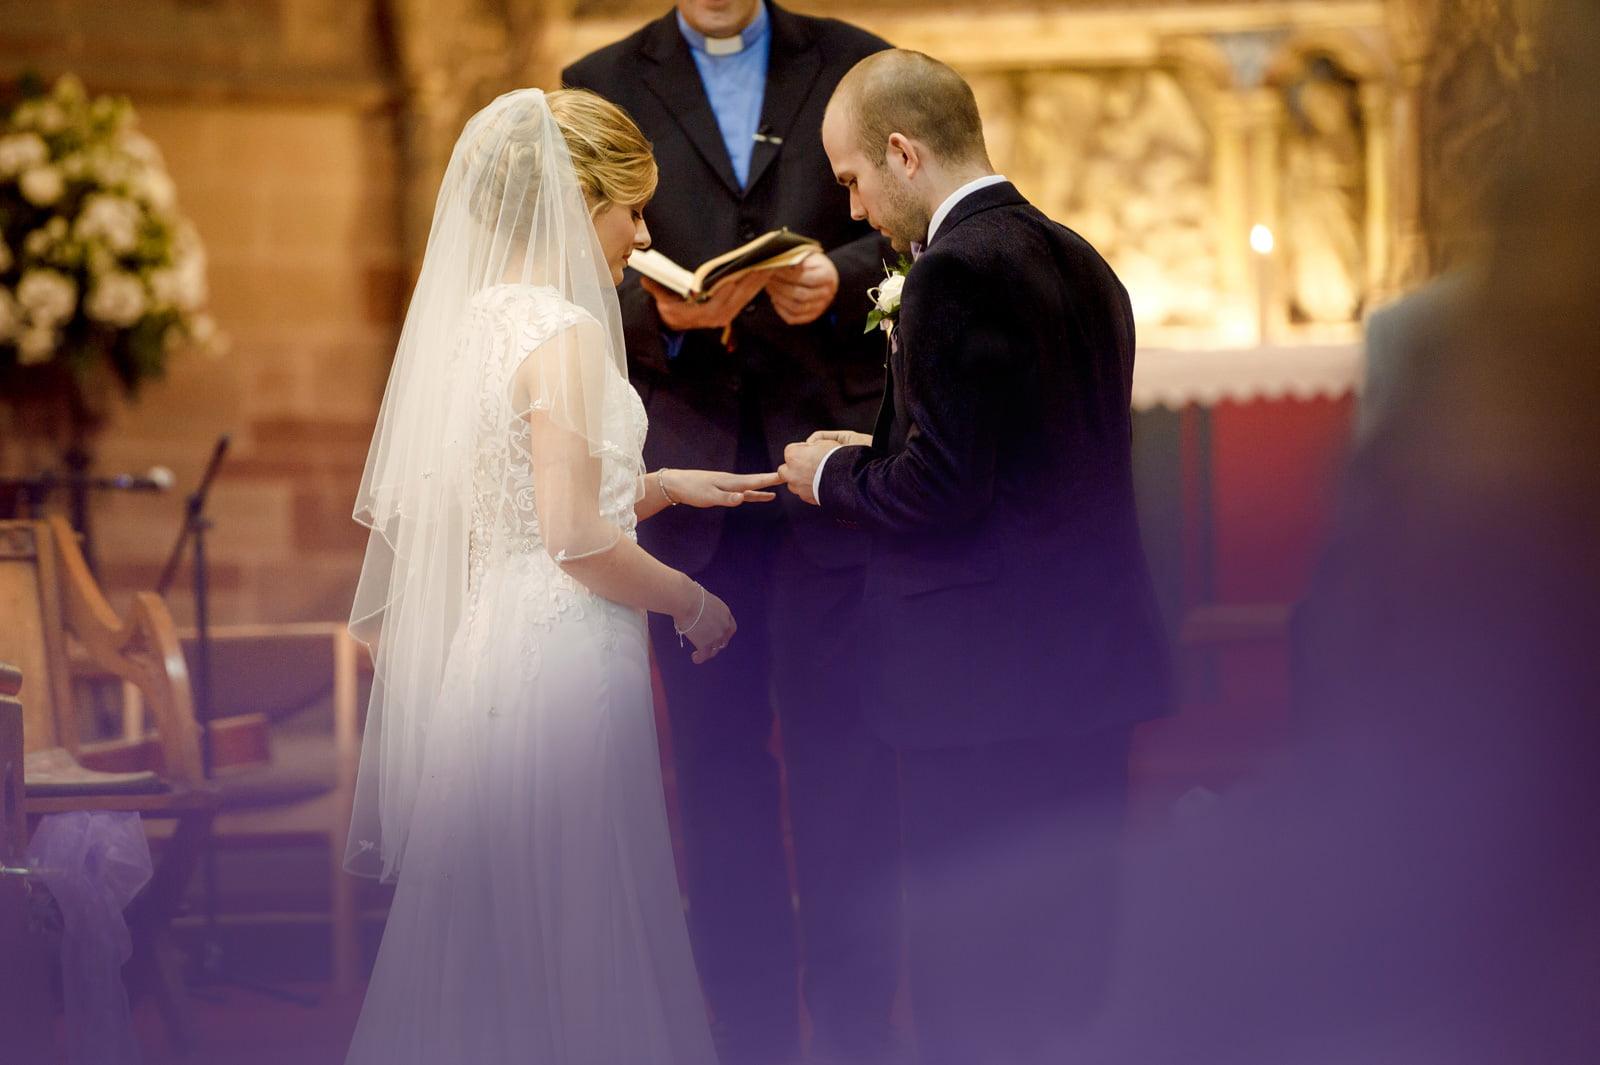 Millers Of Netley wedding, Dorrington, Shrewsbury | Emma + Ben 20